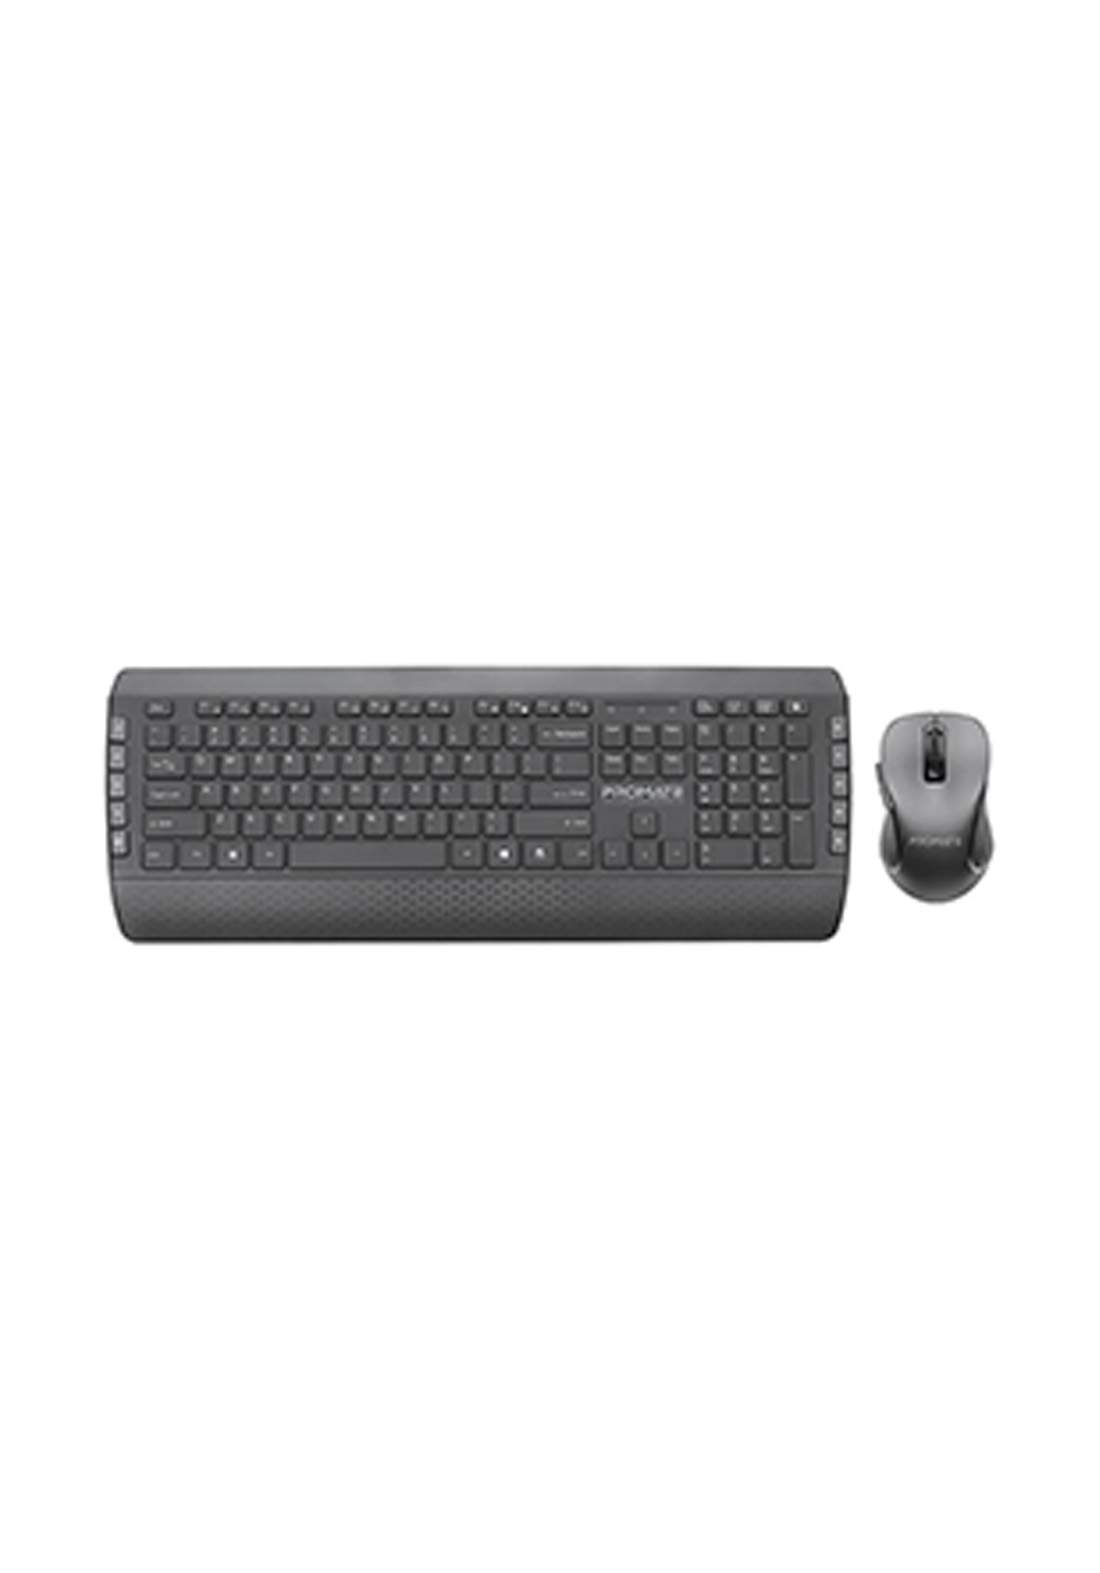 Promate ProCombo-10 Wireless Keyboard and Mouse Combo - Black  لوحة مفاتيح وفارة